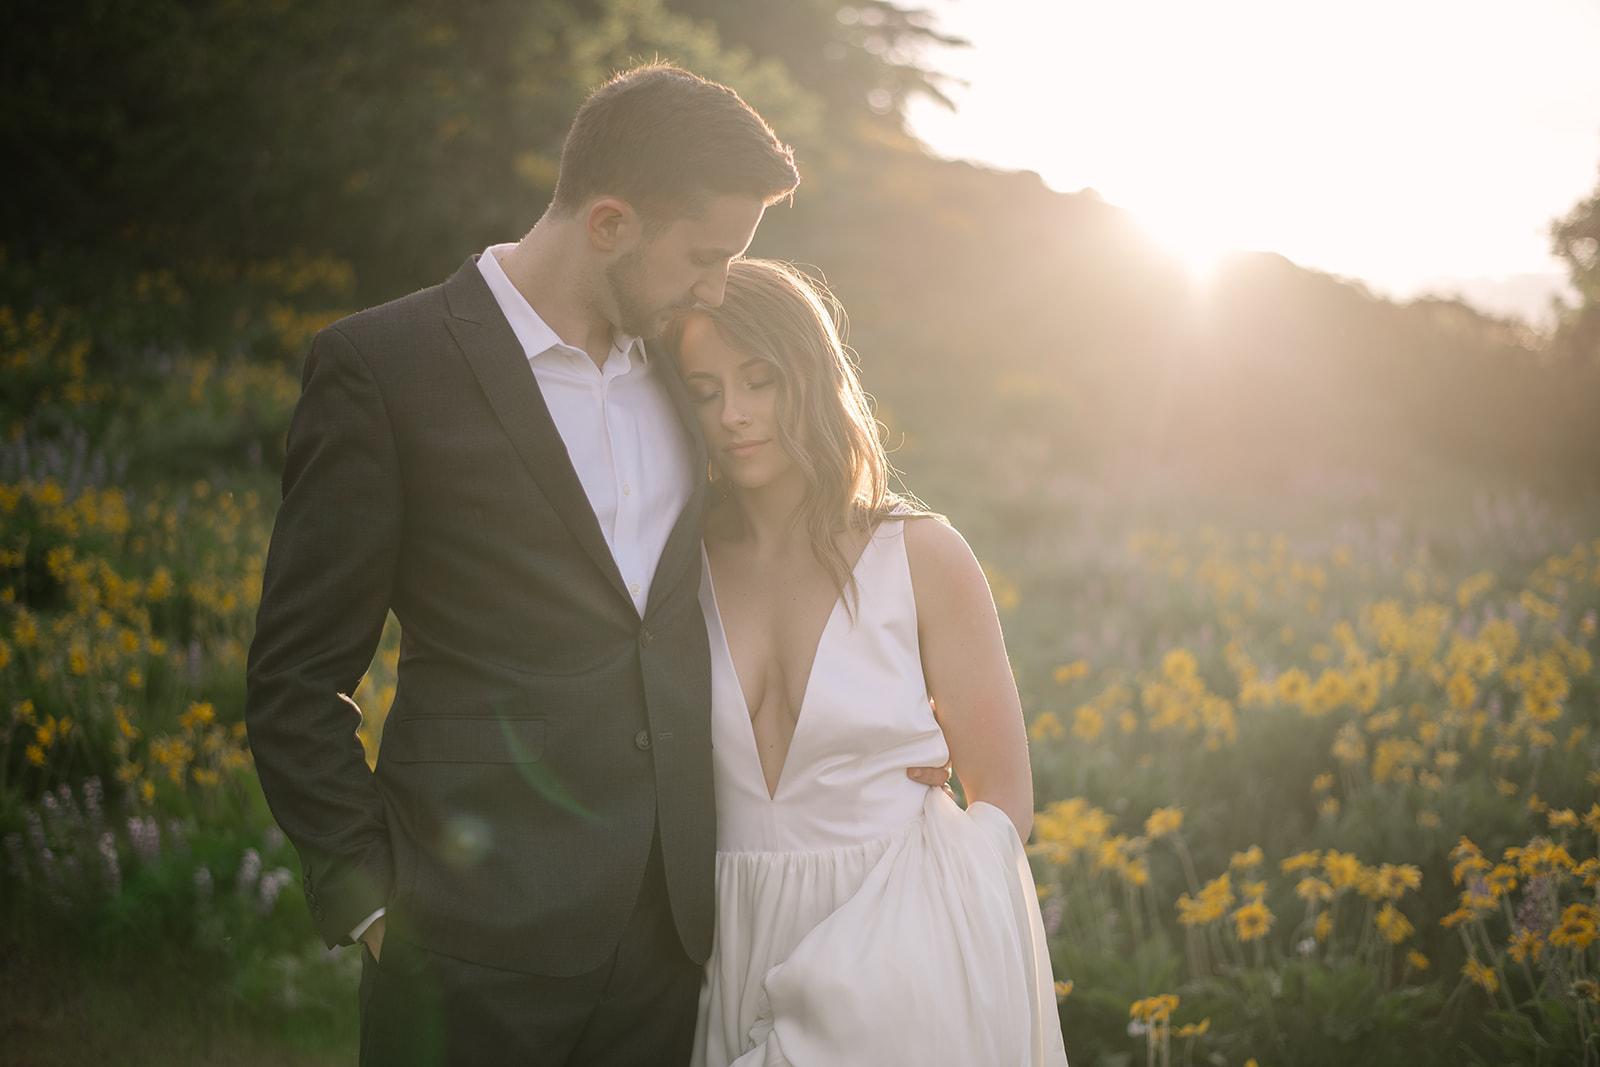 kamea_events_wedding_planner_portland_deus_amor_9913.jpg